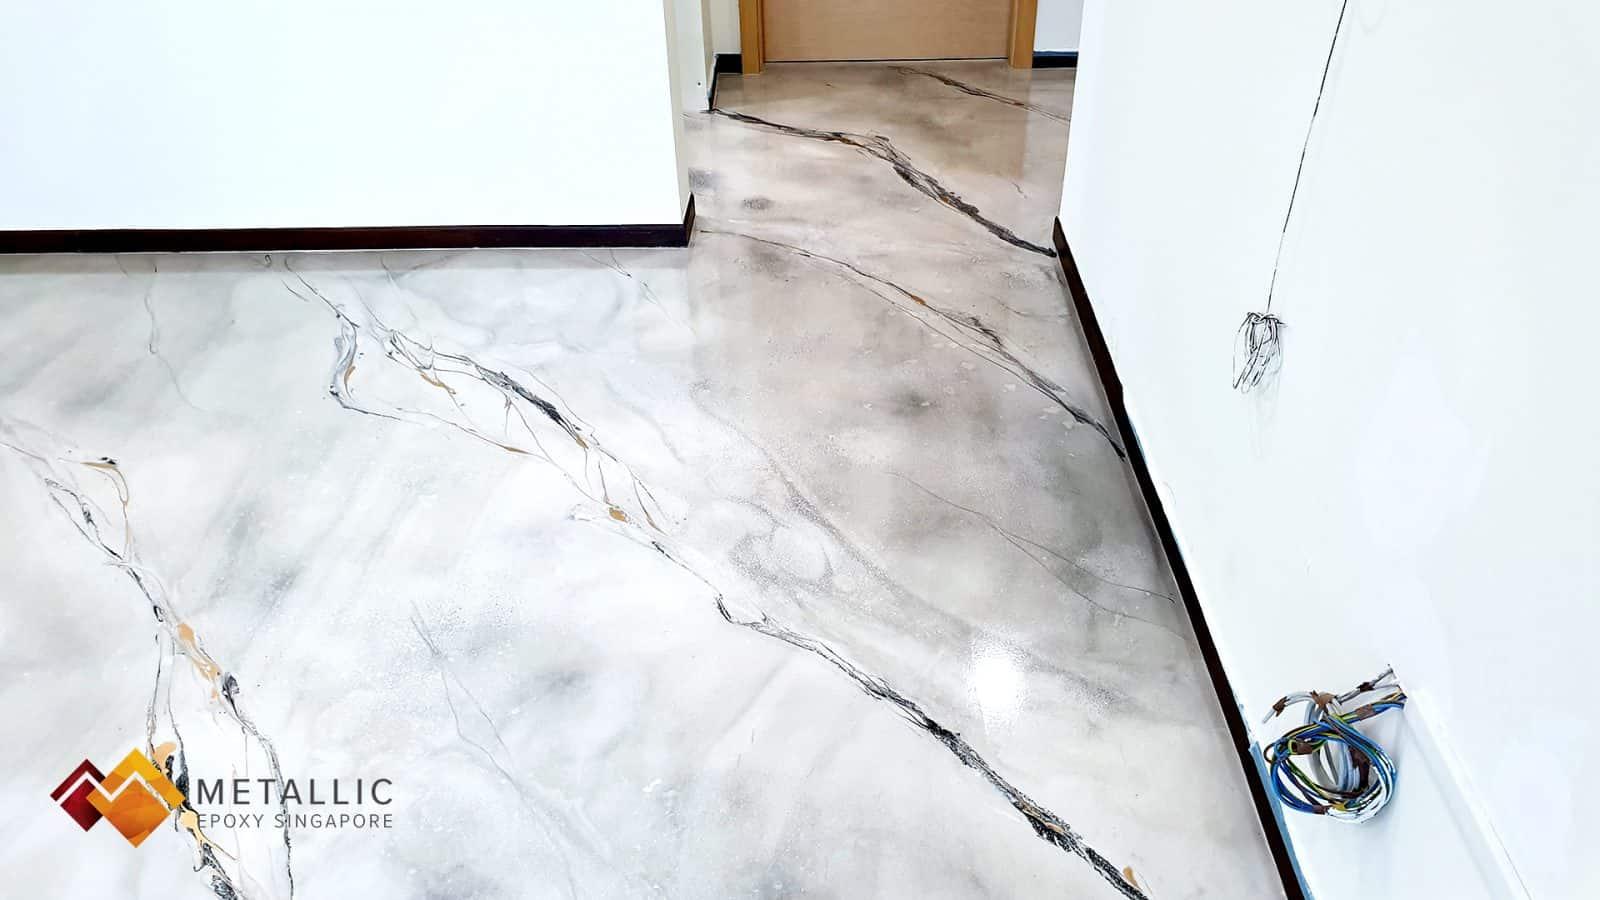 Metallic Epoxy Singapore Harlequin White Marble Flooring